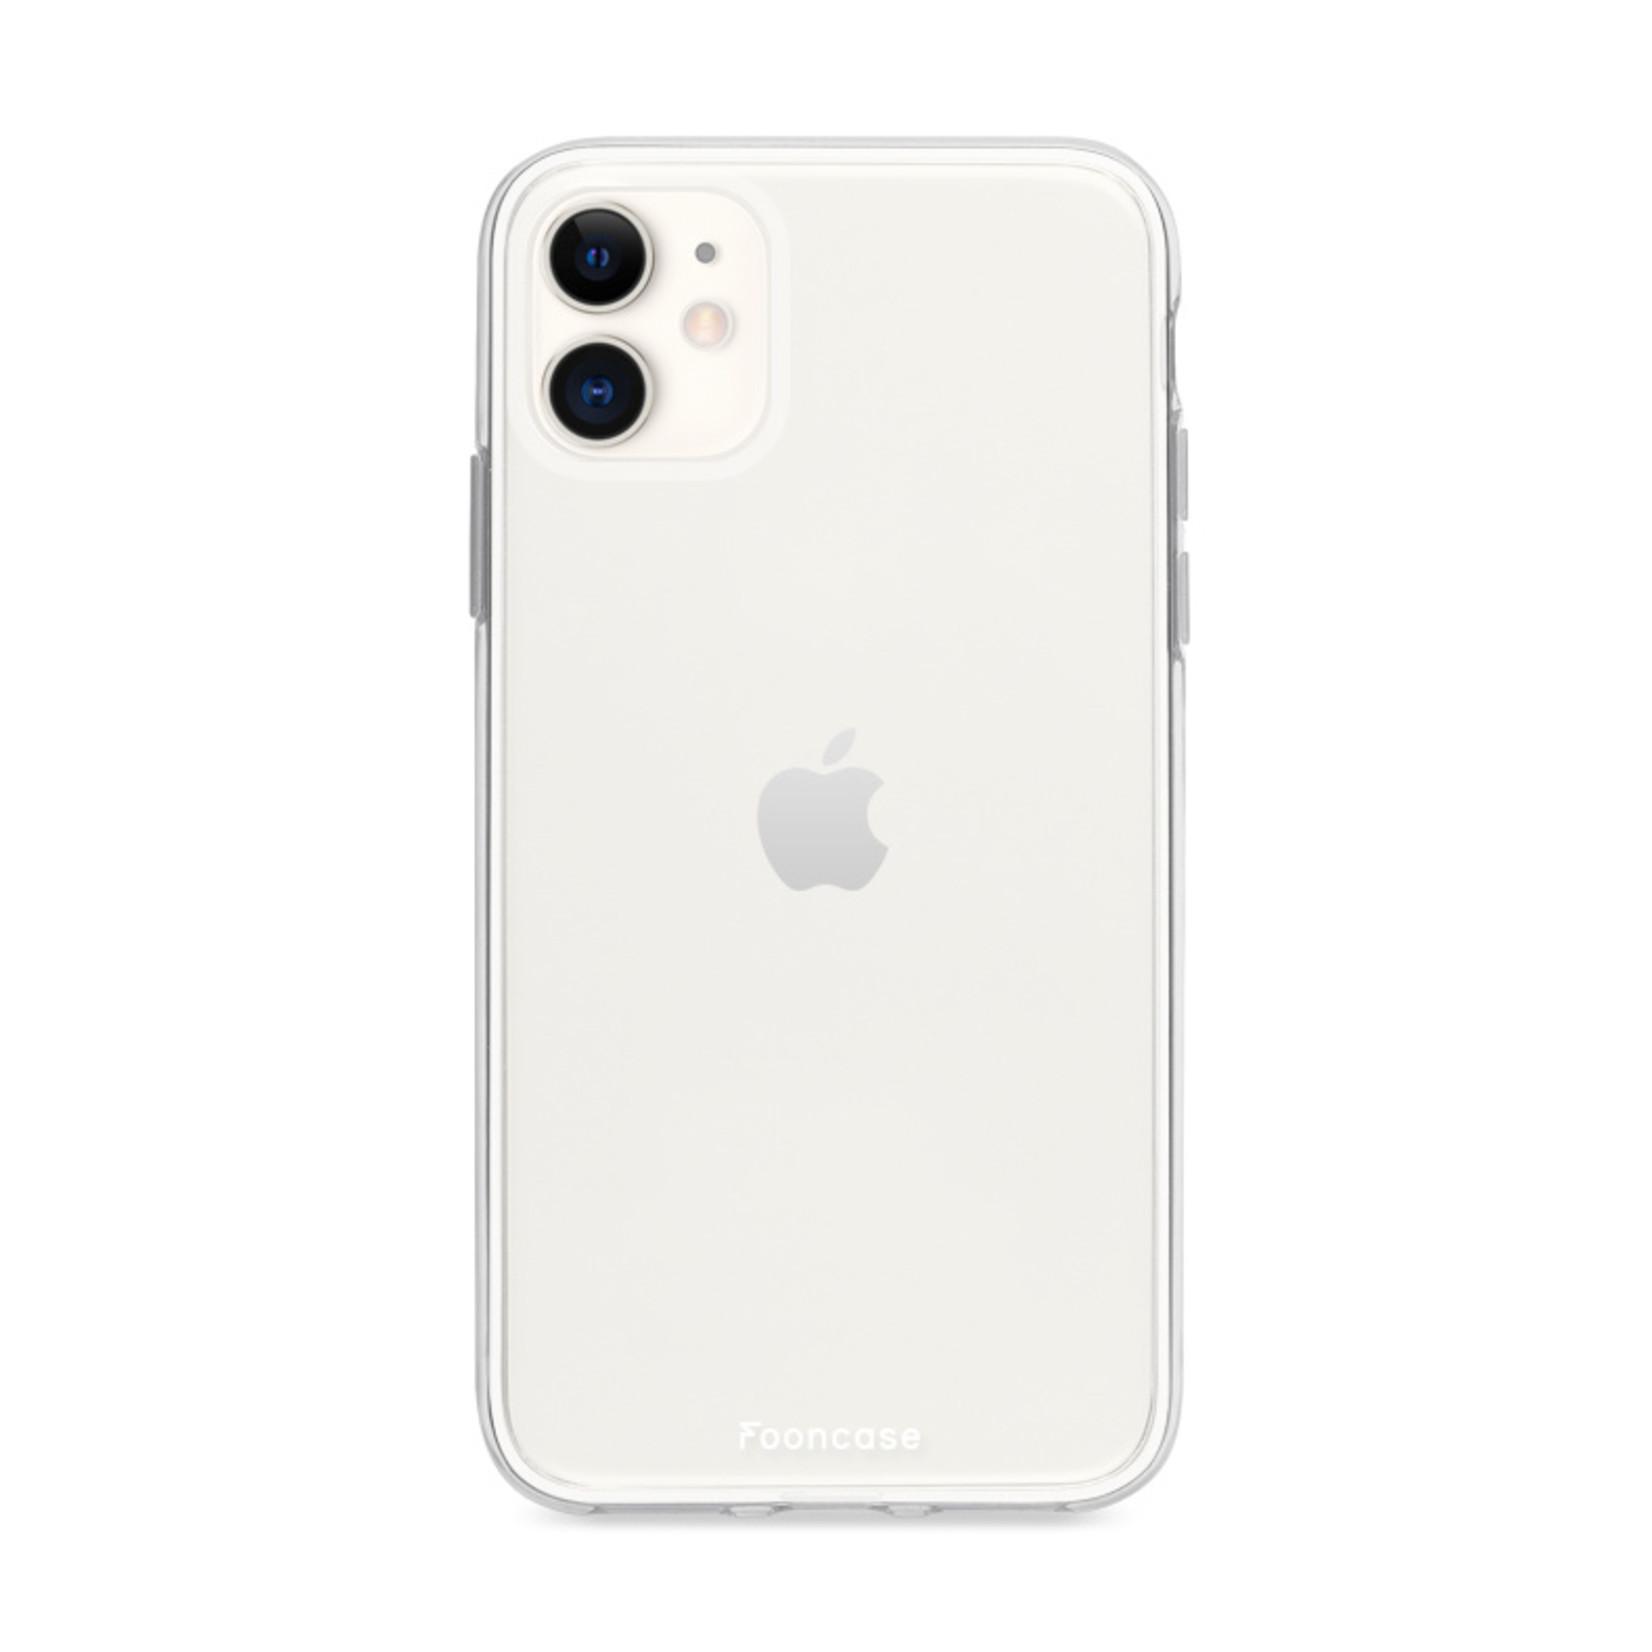 FOONCASE iPhone 12 hoesje TPU Soft Case - Back Cover - Transparant / Doorzichtig